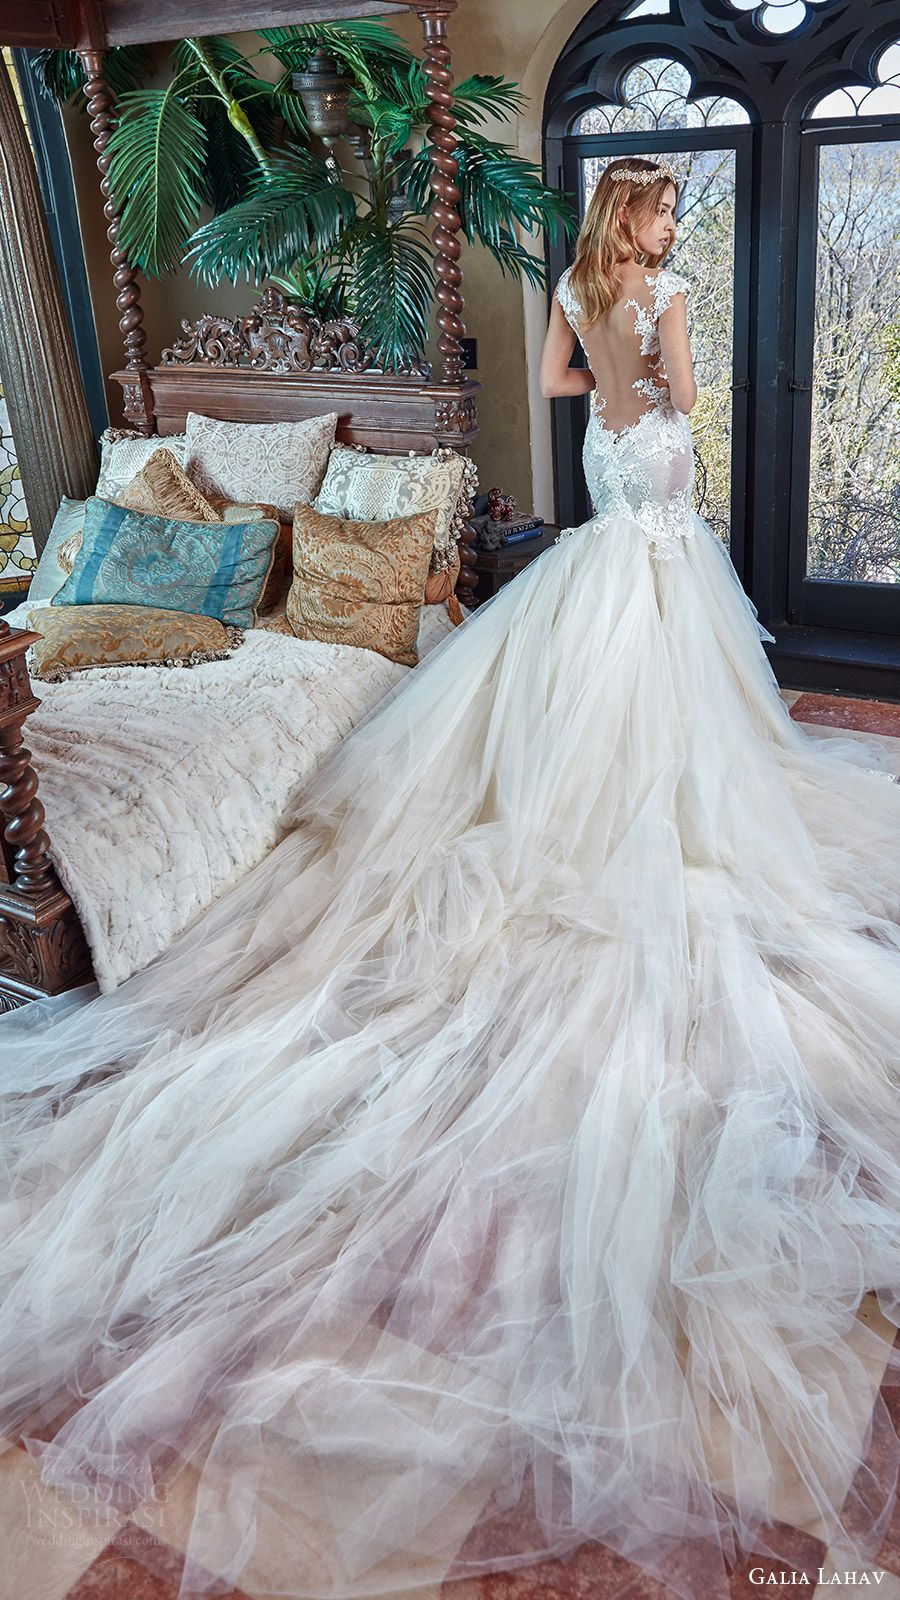 Galia lahav spring couture wedding dresses u ucle secret royal